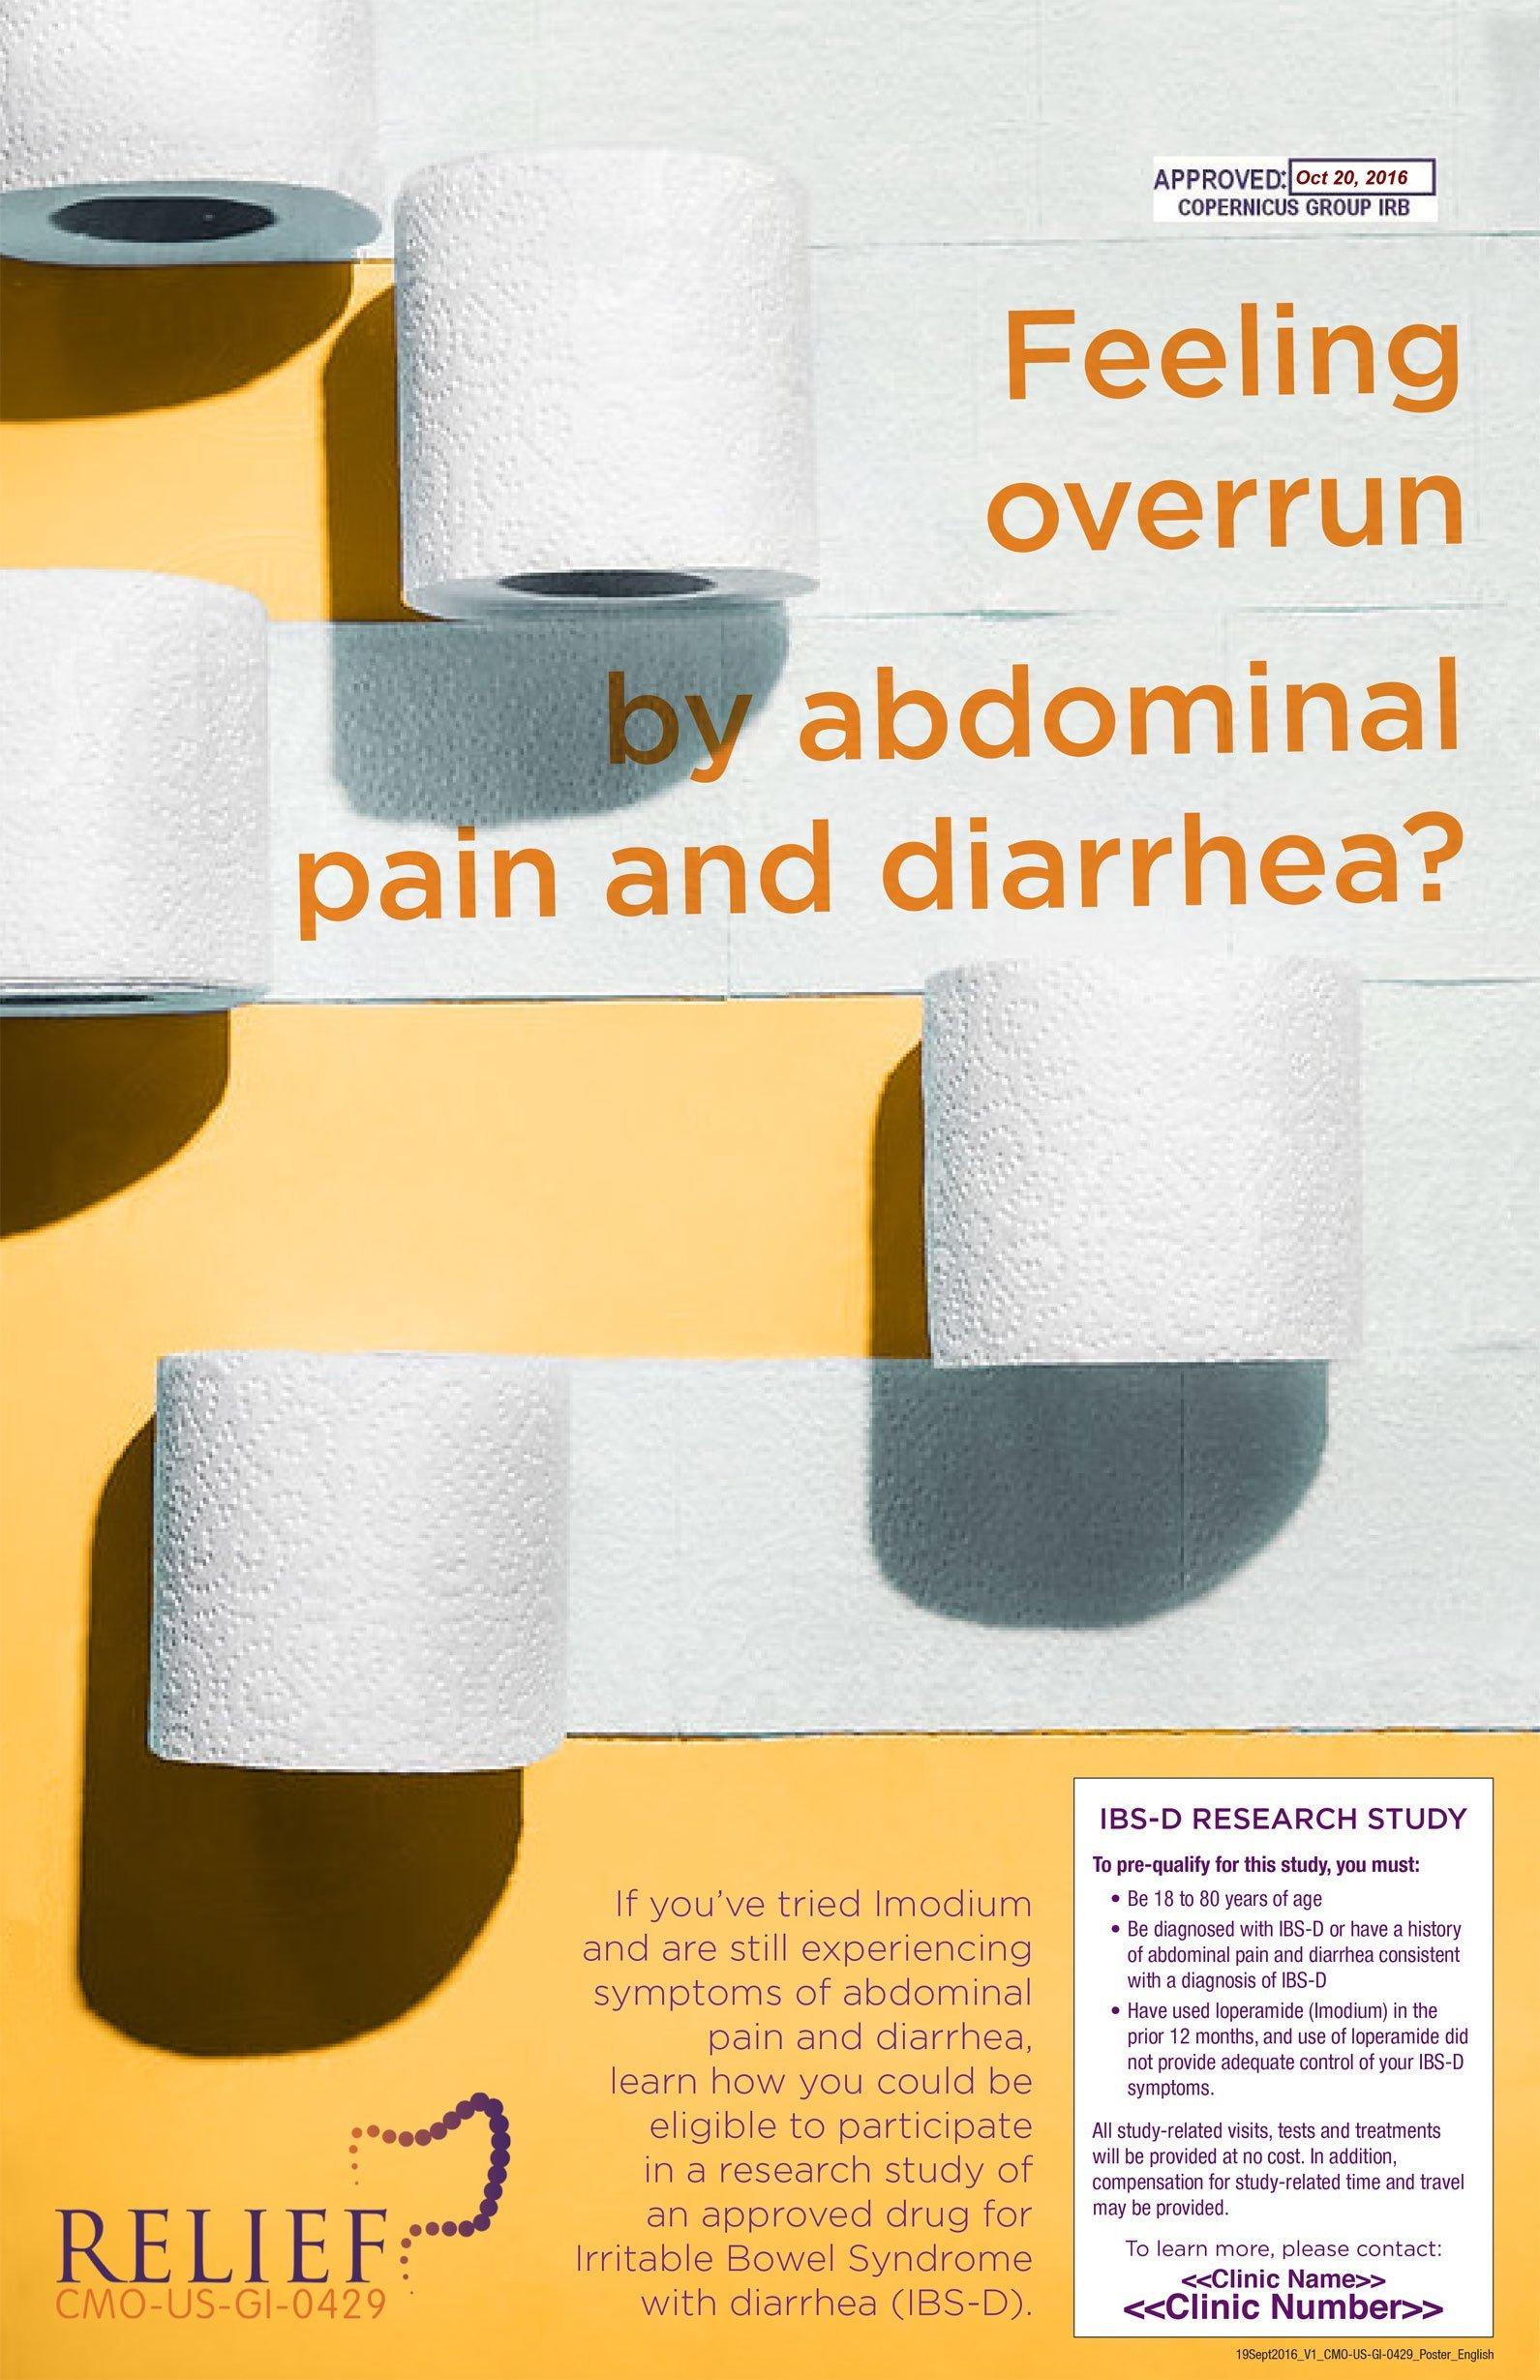 Diarrhea?